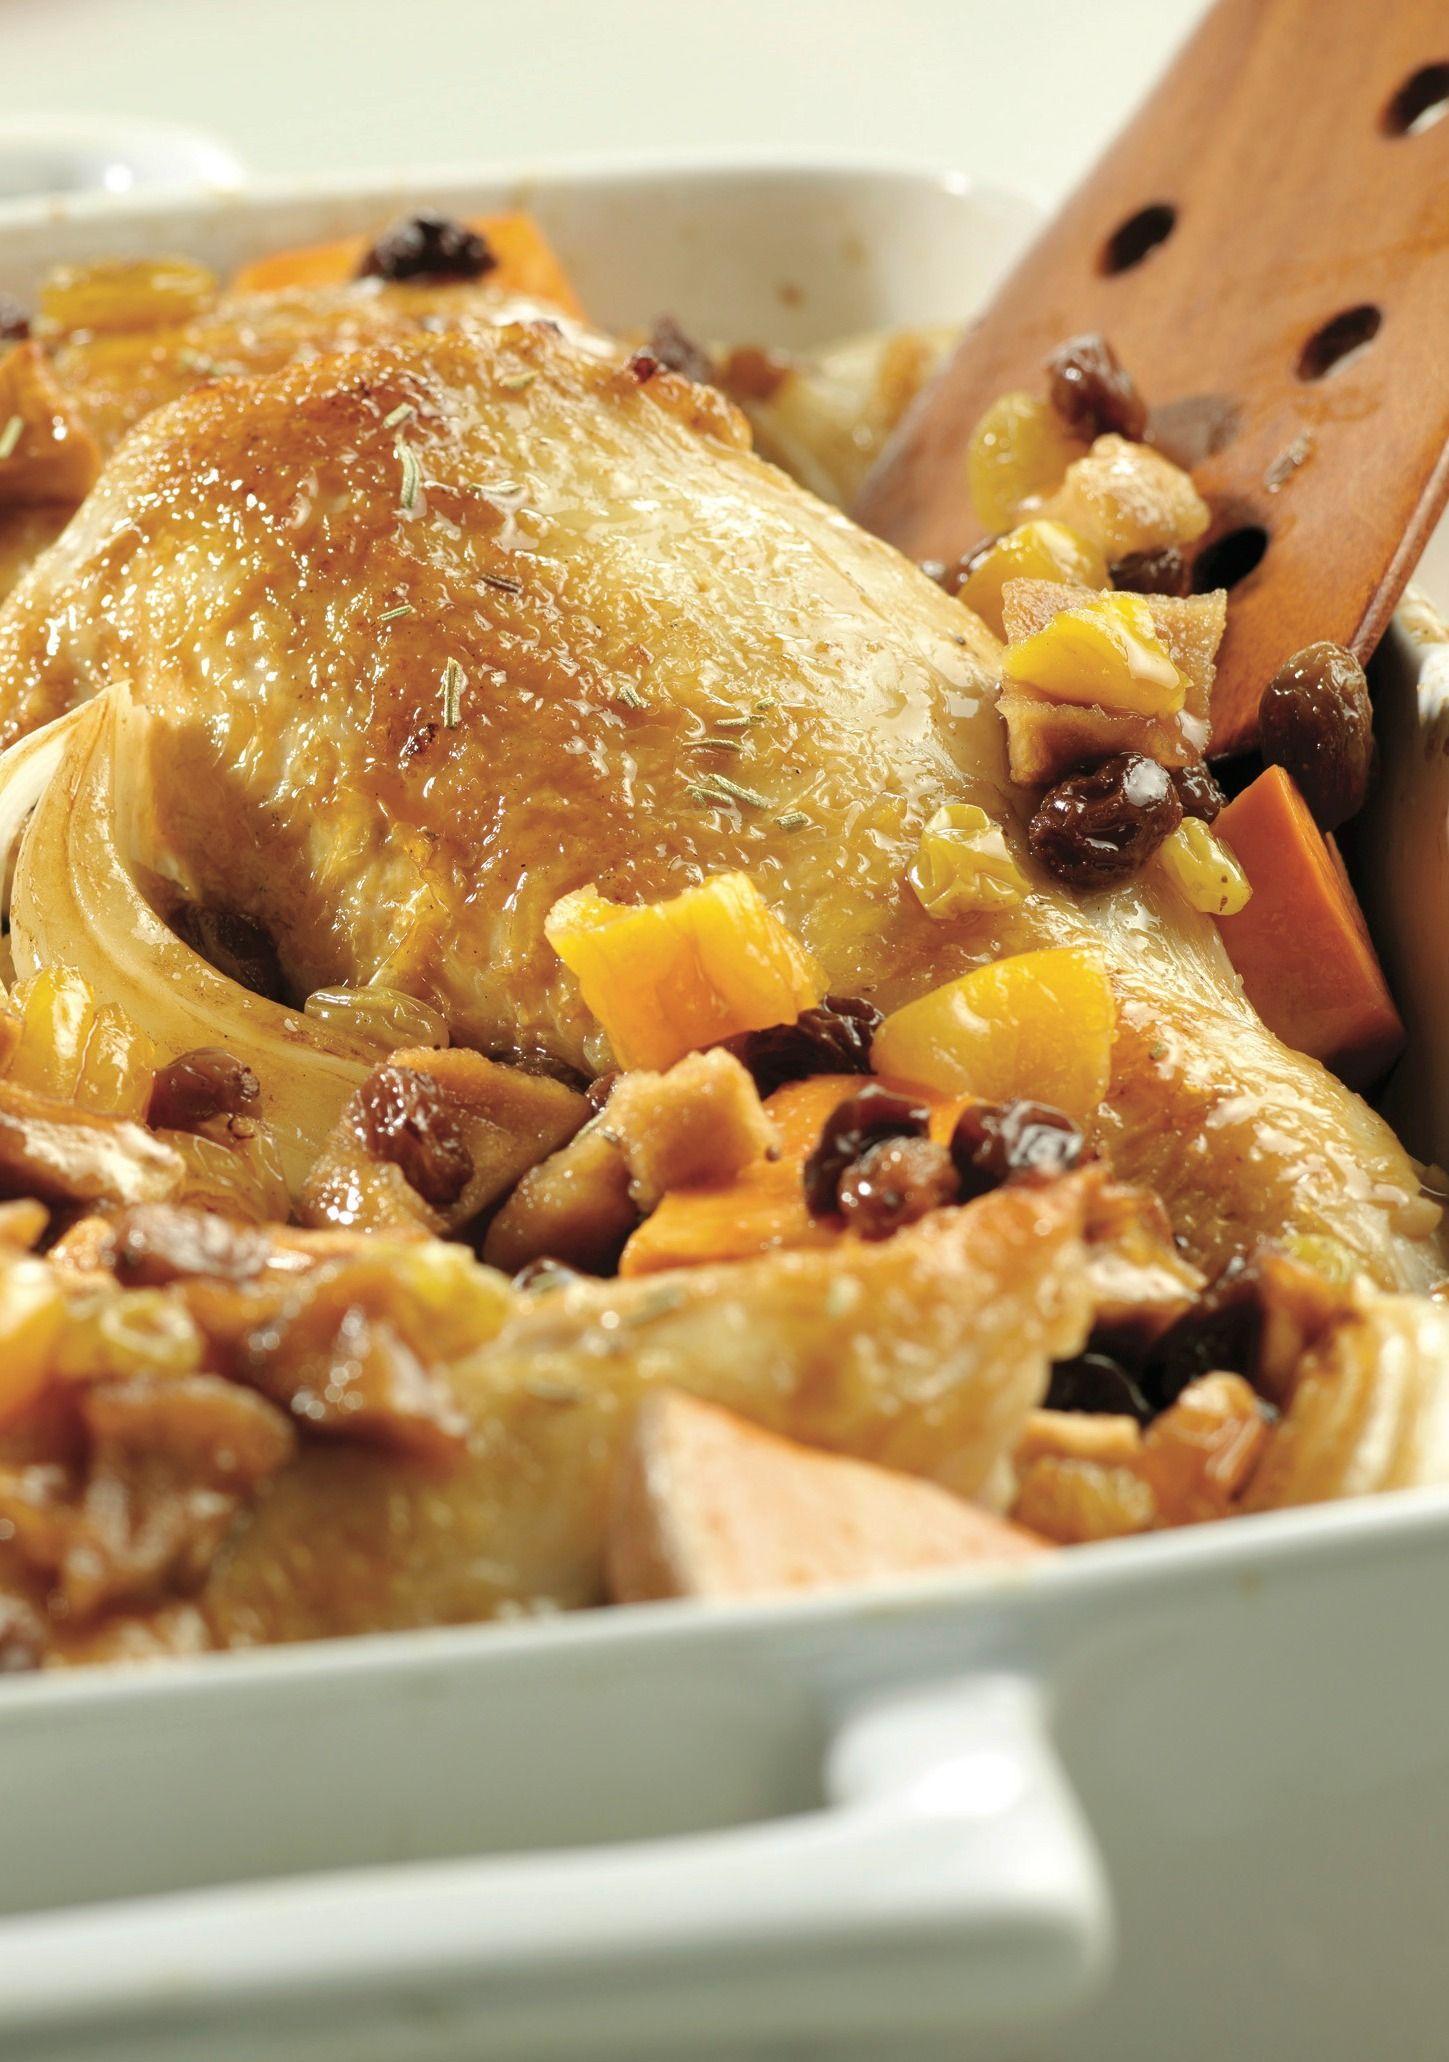 Glazed chicken with fruit sweet potatoes recipe